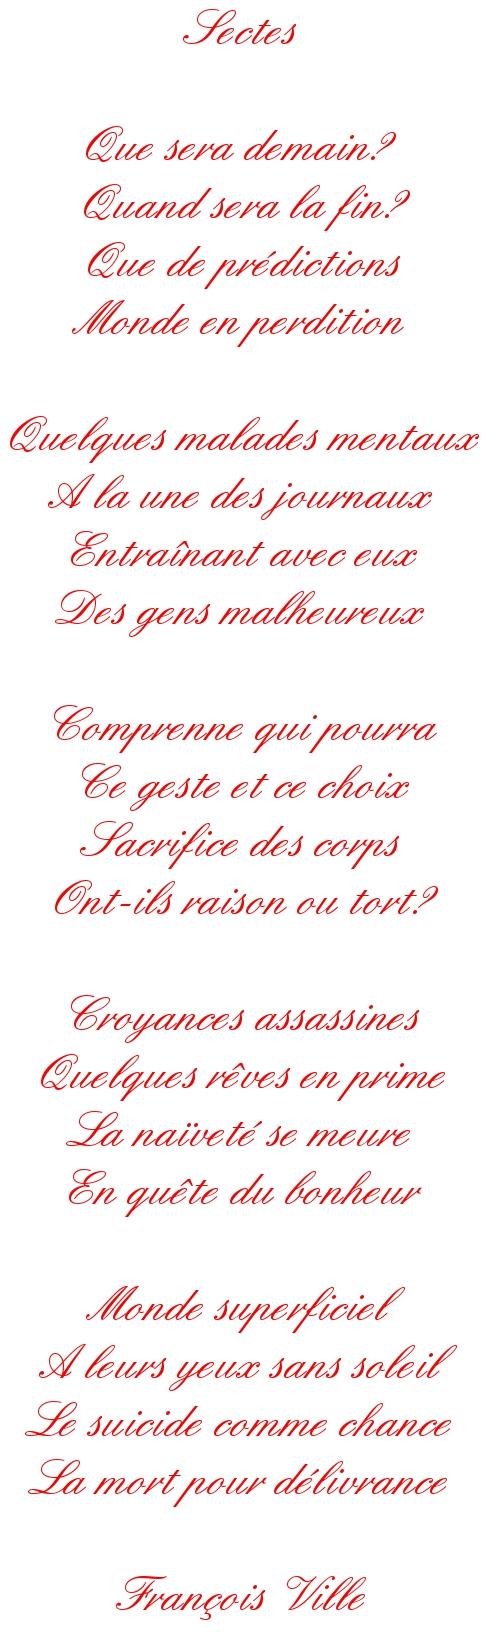 http://francoisville.free.fr/photos/sectes%20-%20francois%20ville.jpg